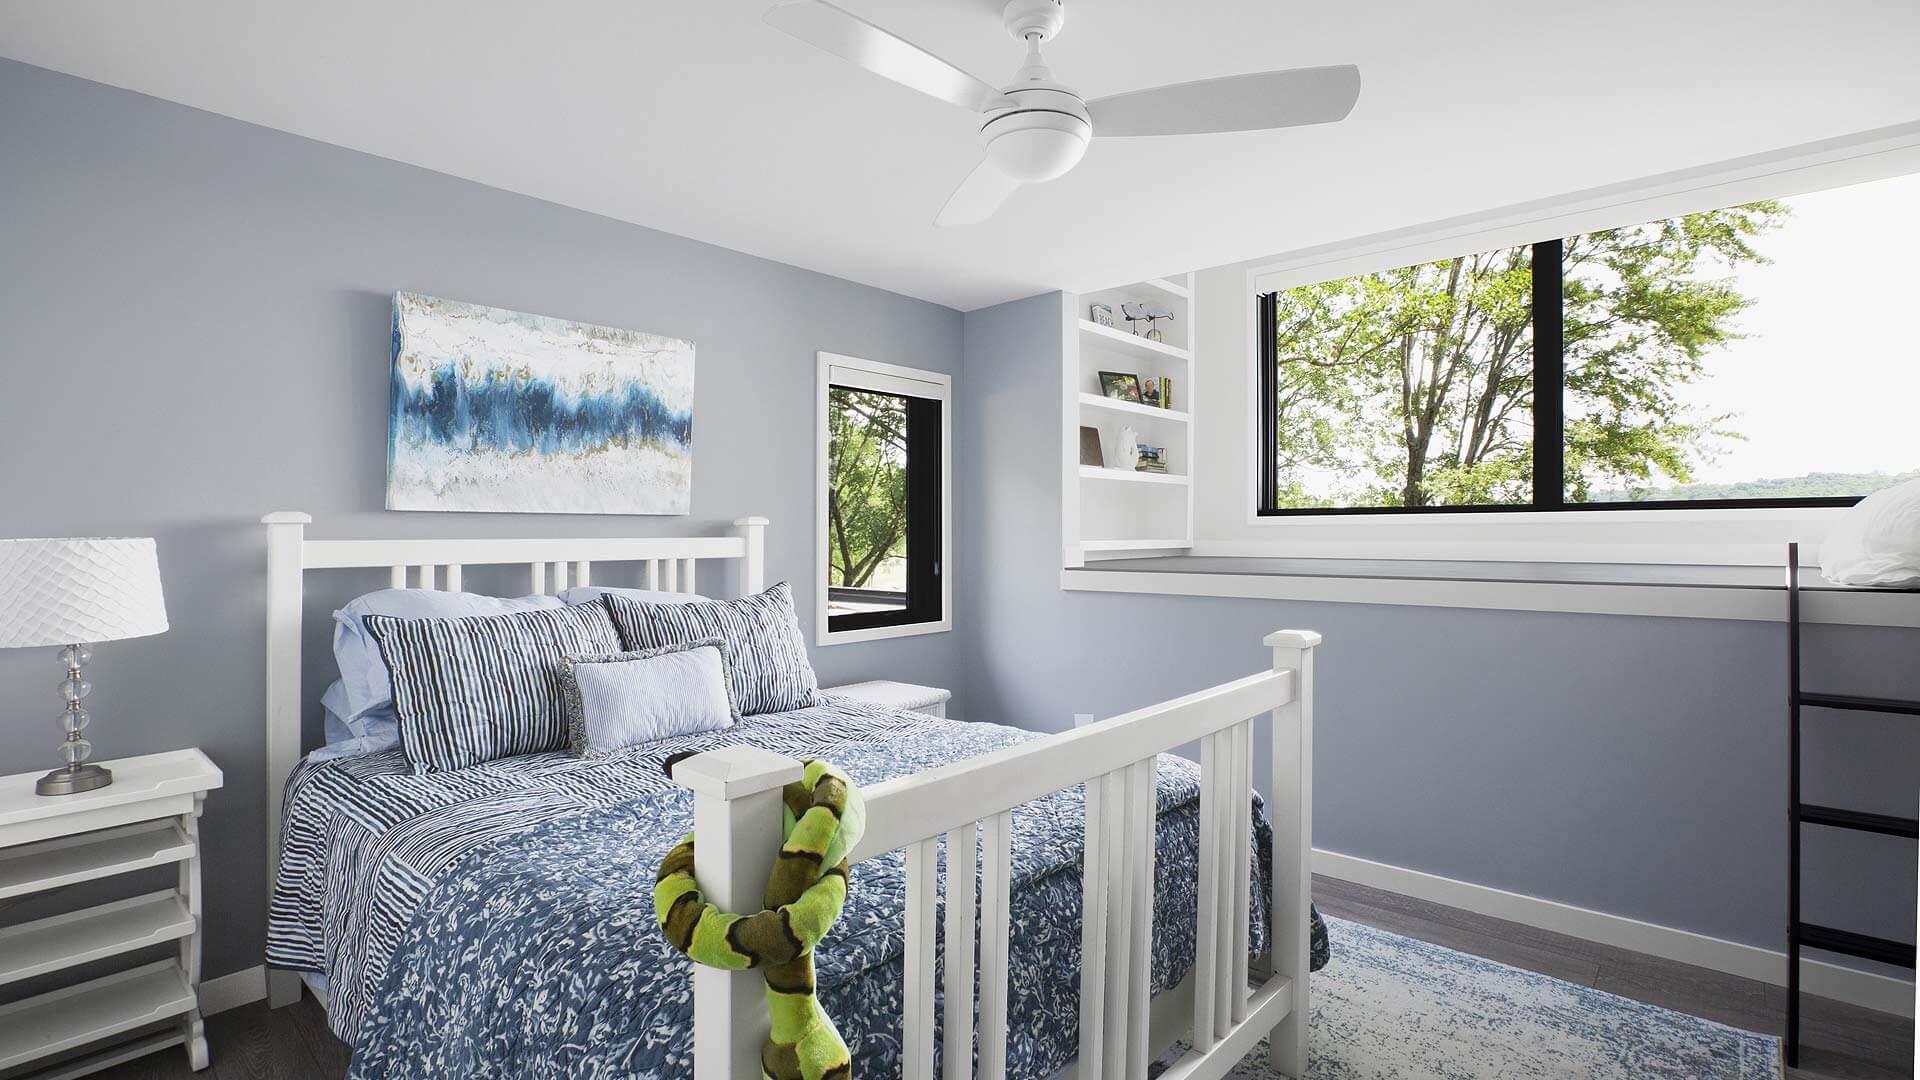 Guest Bedroom with Loft overlooks lakeside - Lakeside Modern Cottage (H-LODGE) - Unionville, Indiana, Lake Lemon